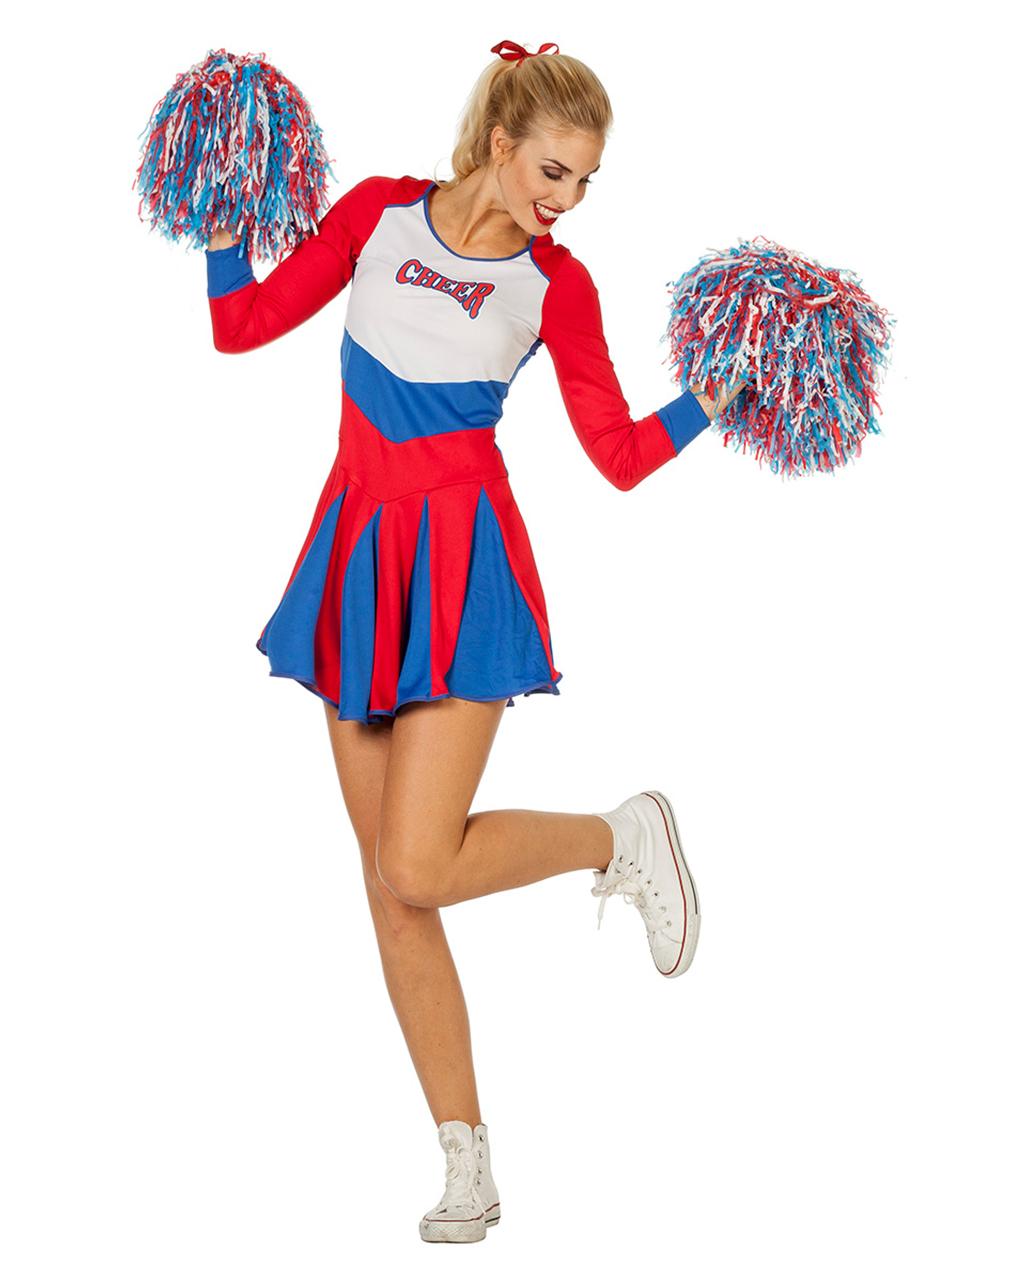 Cheerleader Uniform Zombie Costume Halloween Rosso Nero S 36//38 Costume da donna